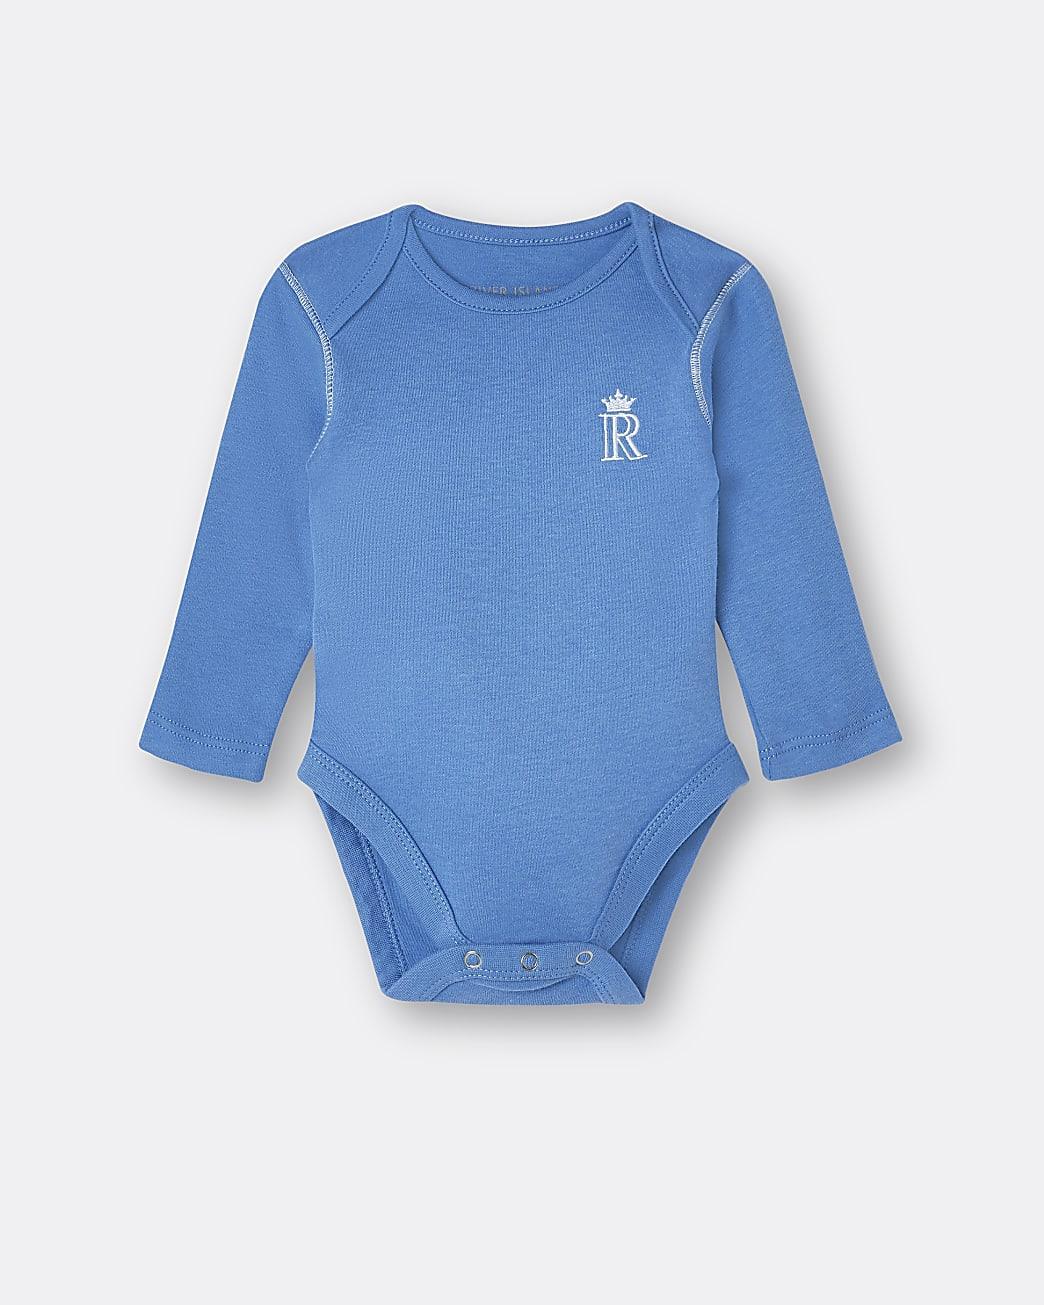 Baby boys blue RI embroidered babygrow